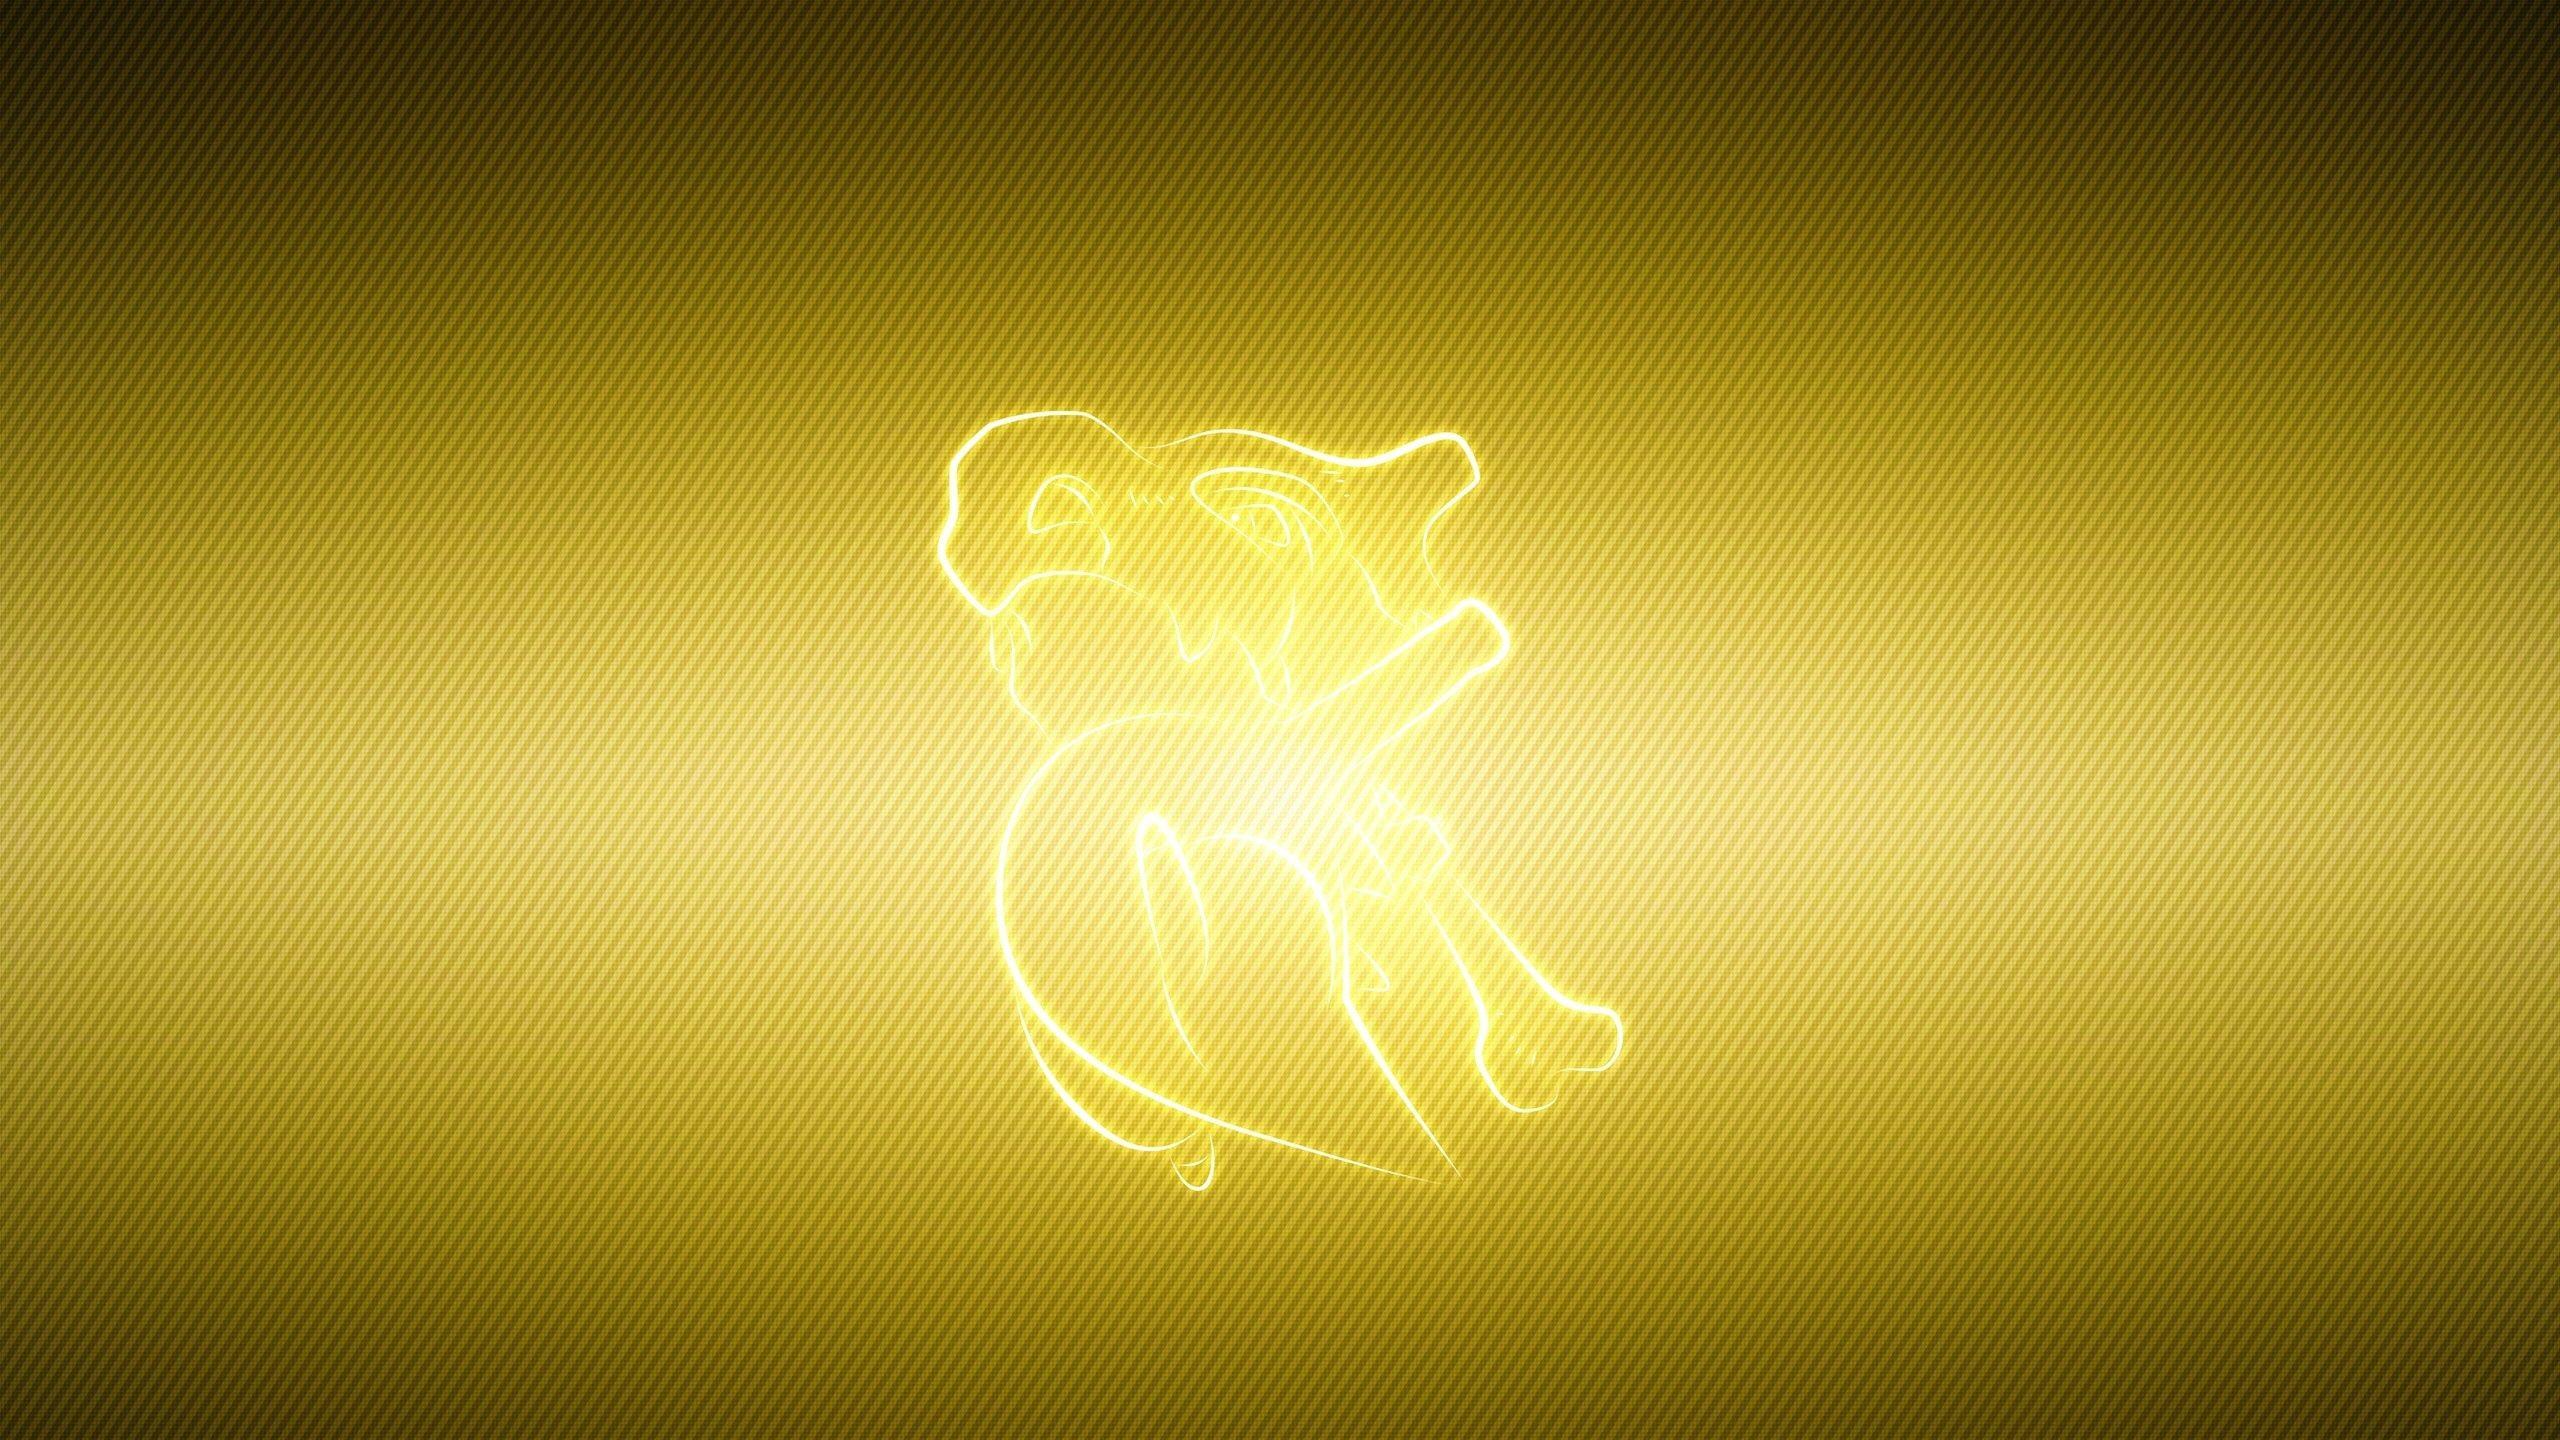 Mac iMac 27 Pokemon Wallpapers HD, Desktop Backgrounds 2560×1440